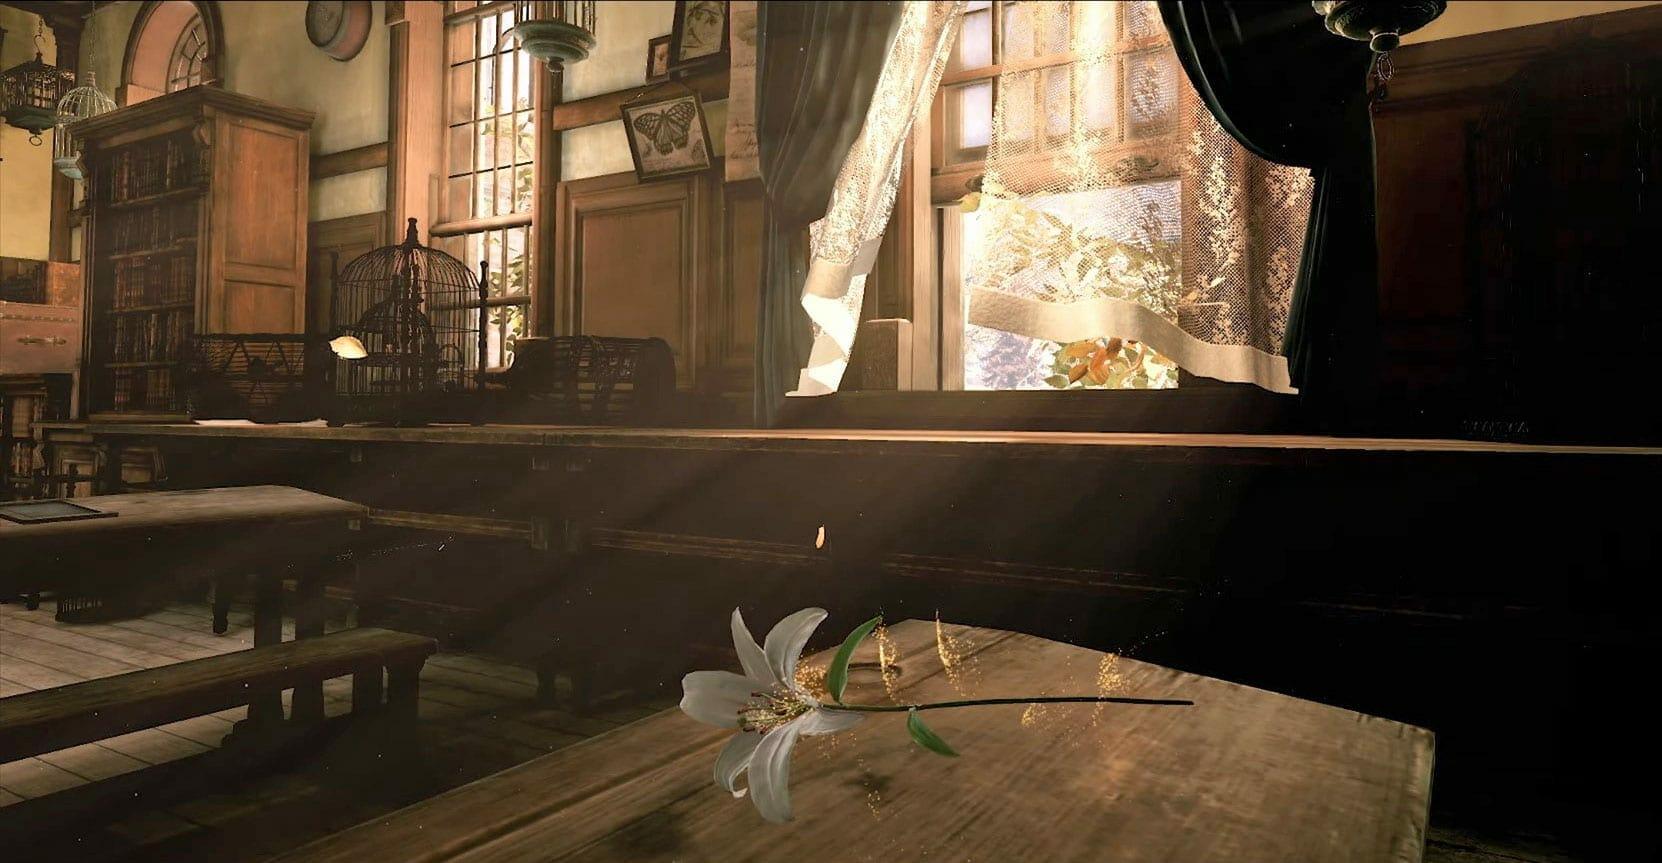 Déraciné for PSVR Release Date